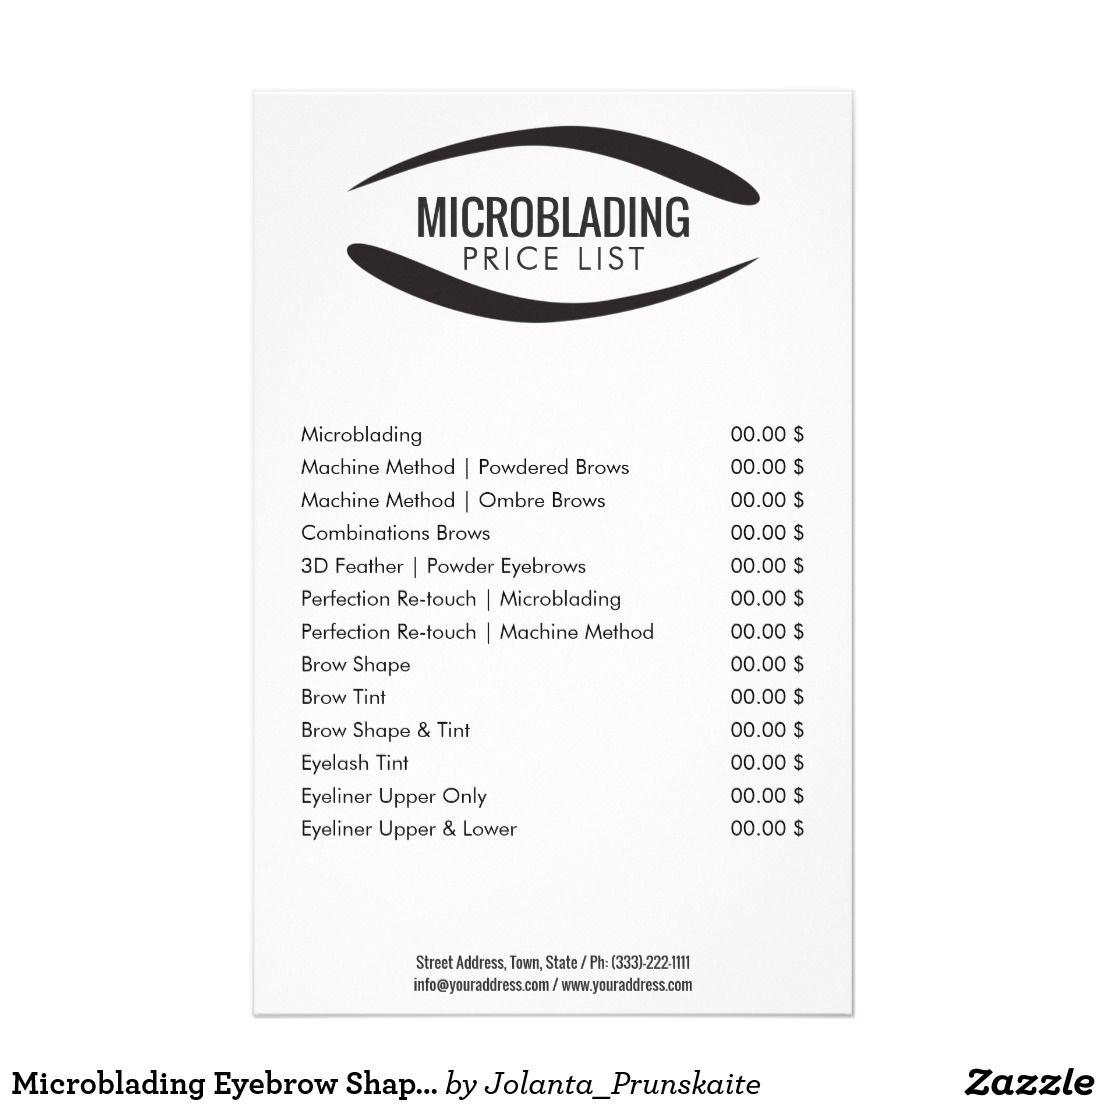 Microblading Eyebrow Shape Tattoo Price List Flyer Zazzle Com In 2021 Microblading Microblading Eyebrows Eyebrow Shaping